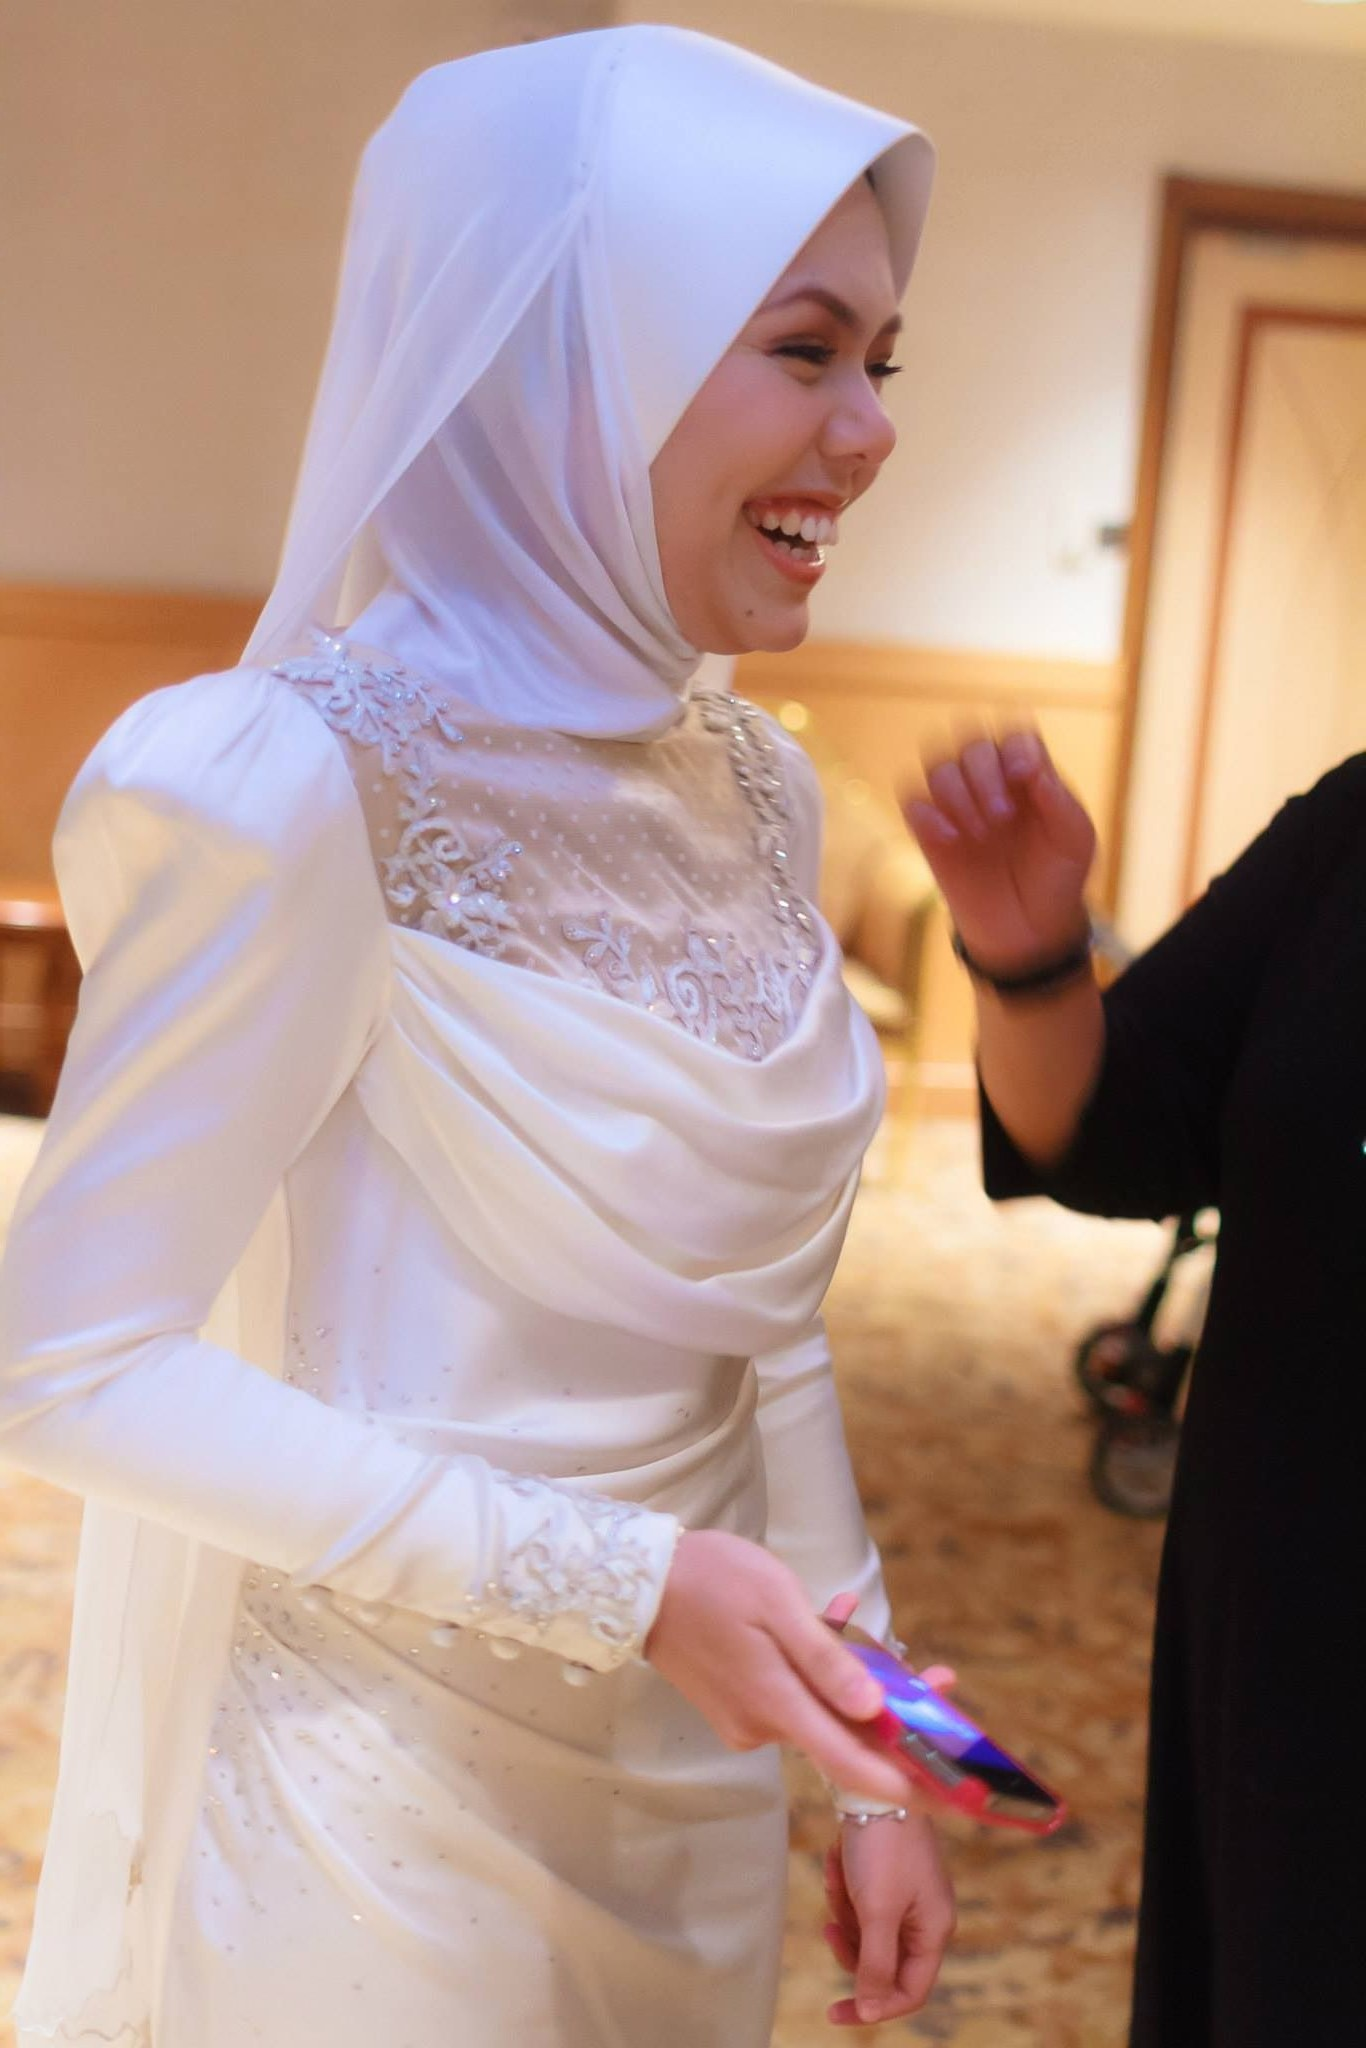 Ide Baju Pengantin Muslimah Drdp Baju Pengantin Moden Baju Pengantin songket by Melinda